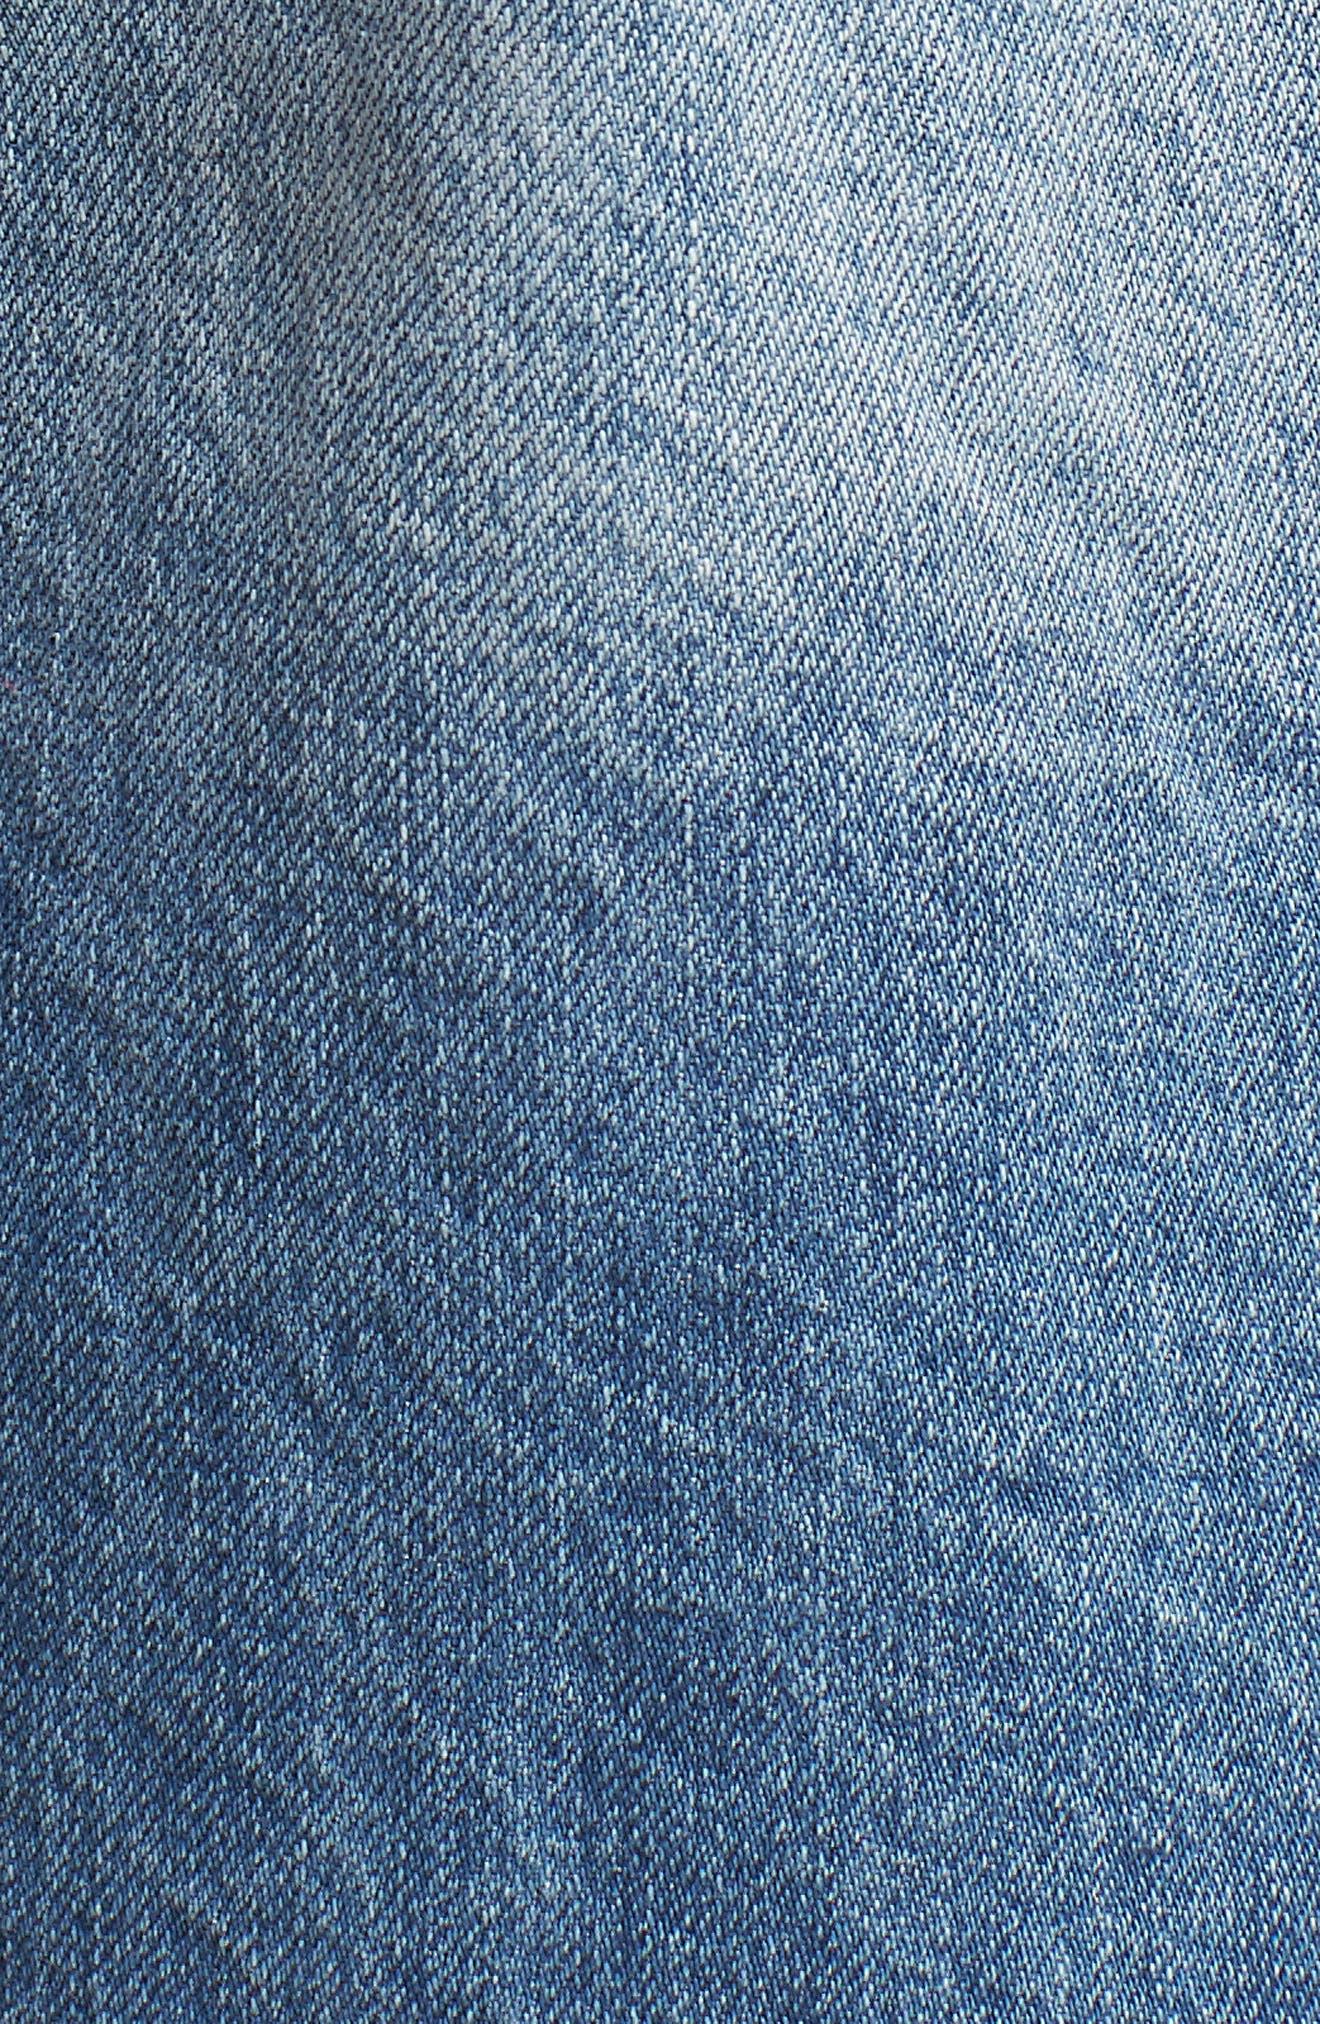 Shredded Denim Bermuda Shorts,                             Alternate thumbnail 6, color,